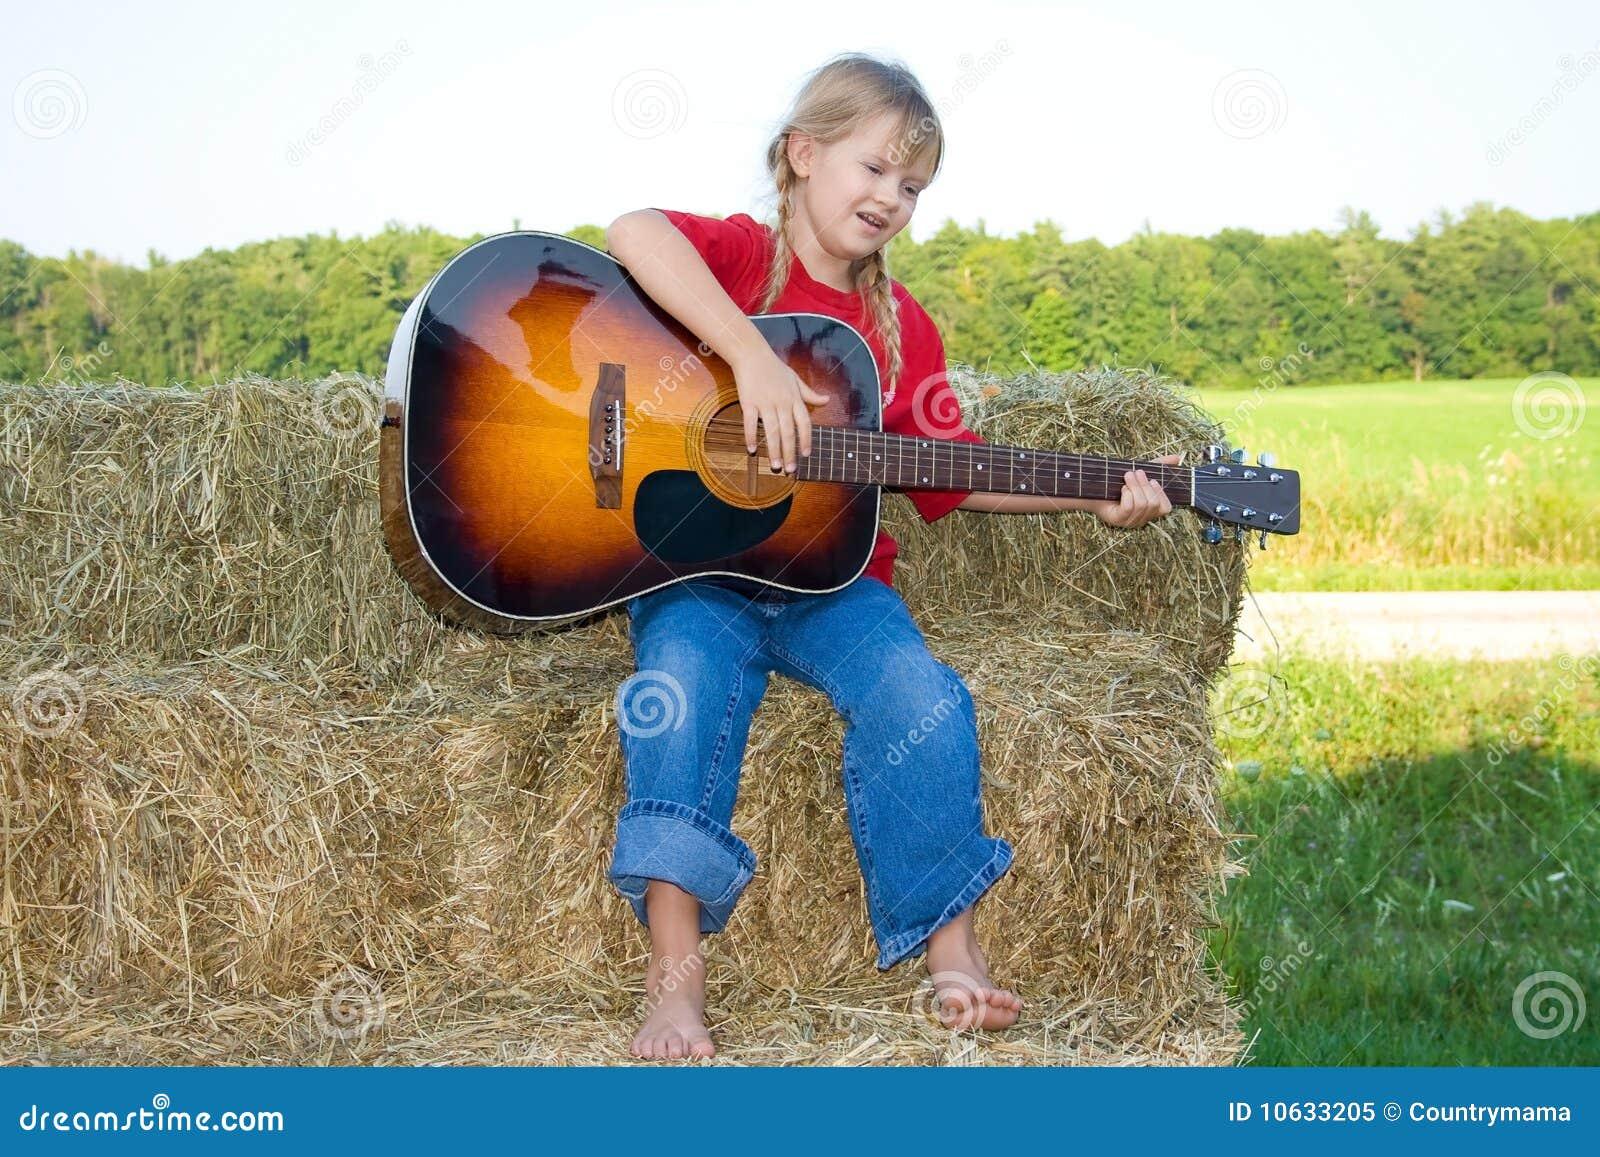 Child playing instrument.